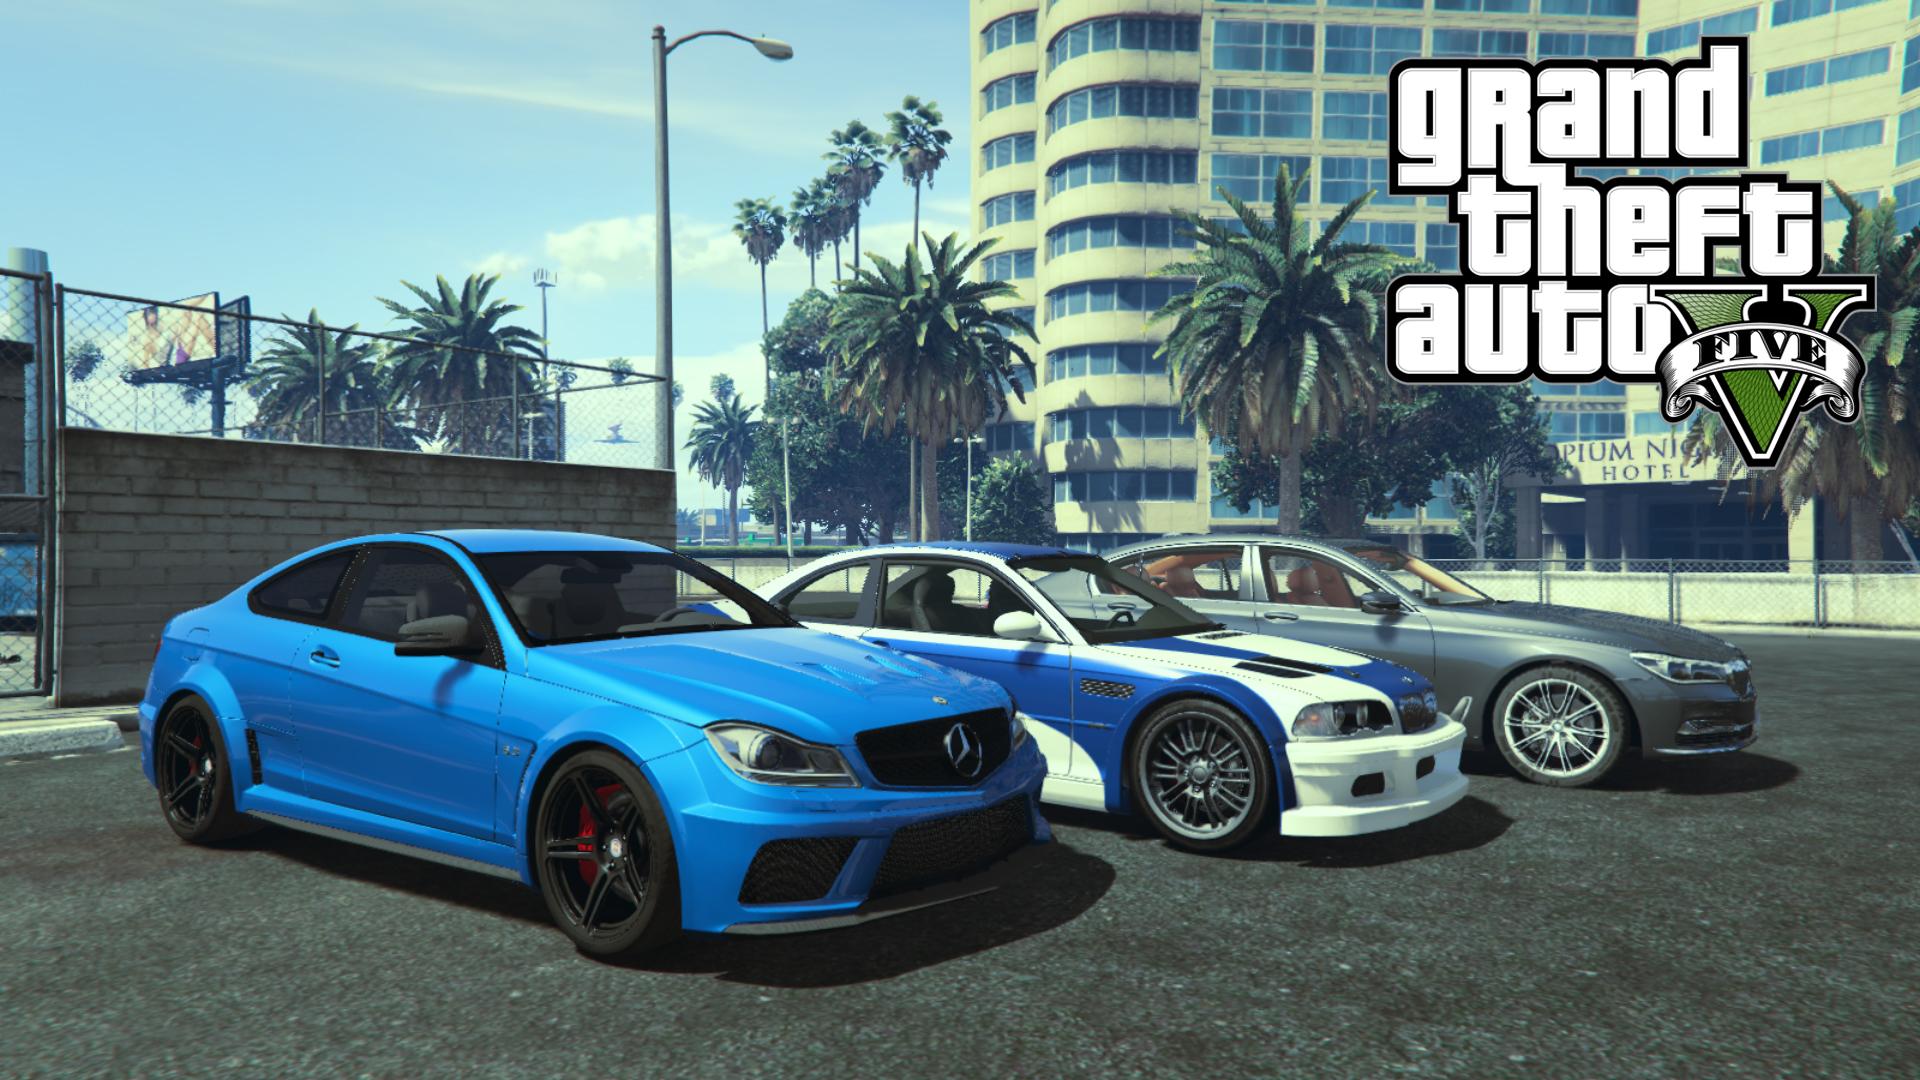 5 Best Car Pack v2 - Vehicules pour GTA V sur GTA Modding